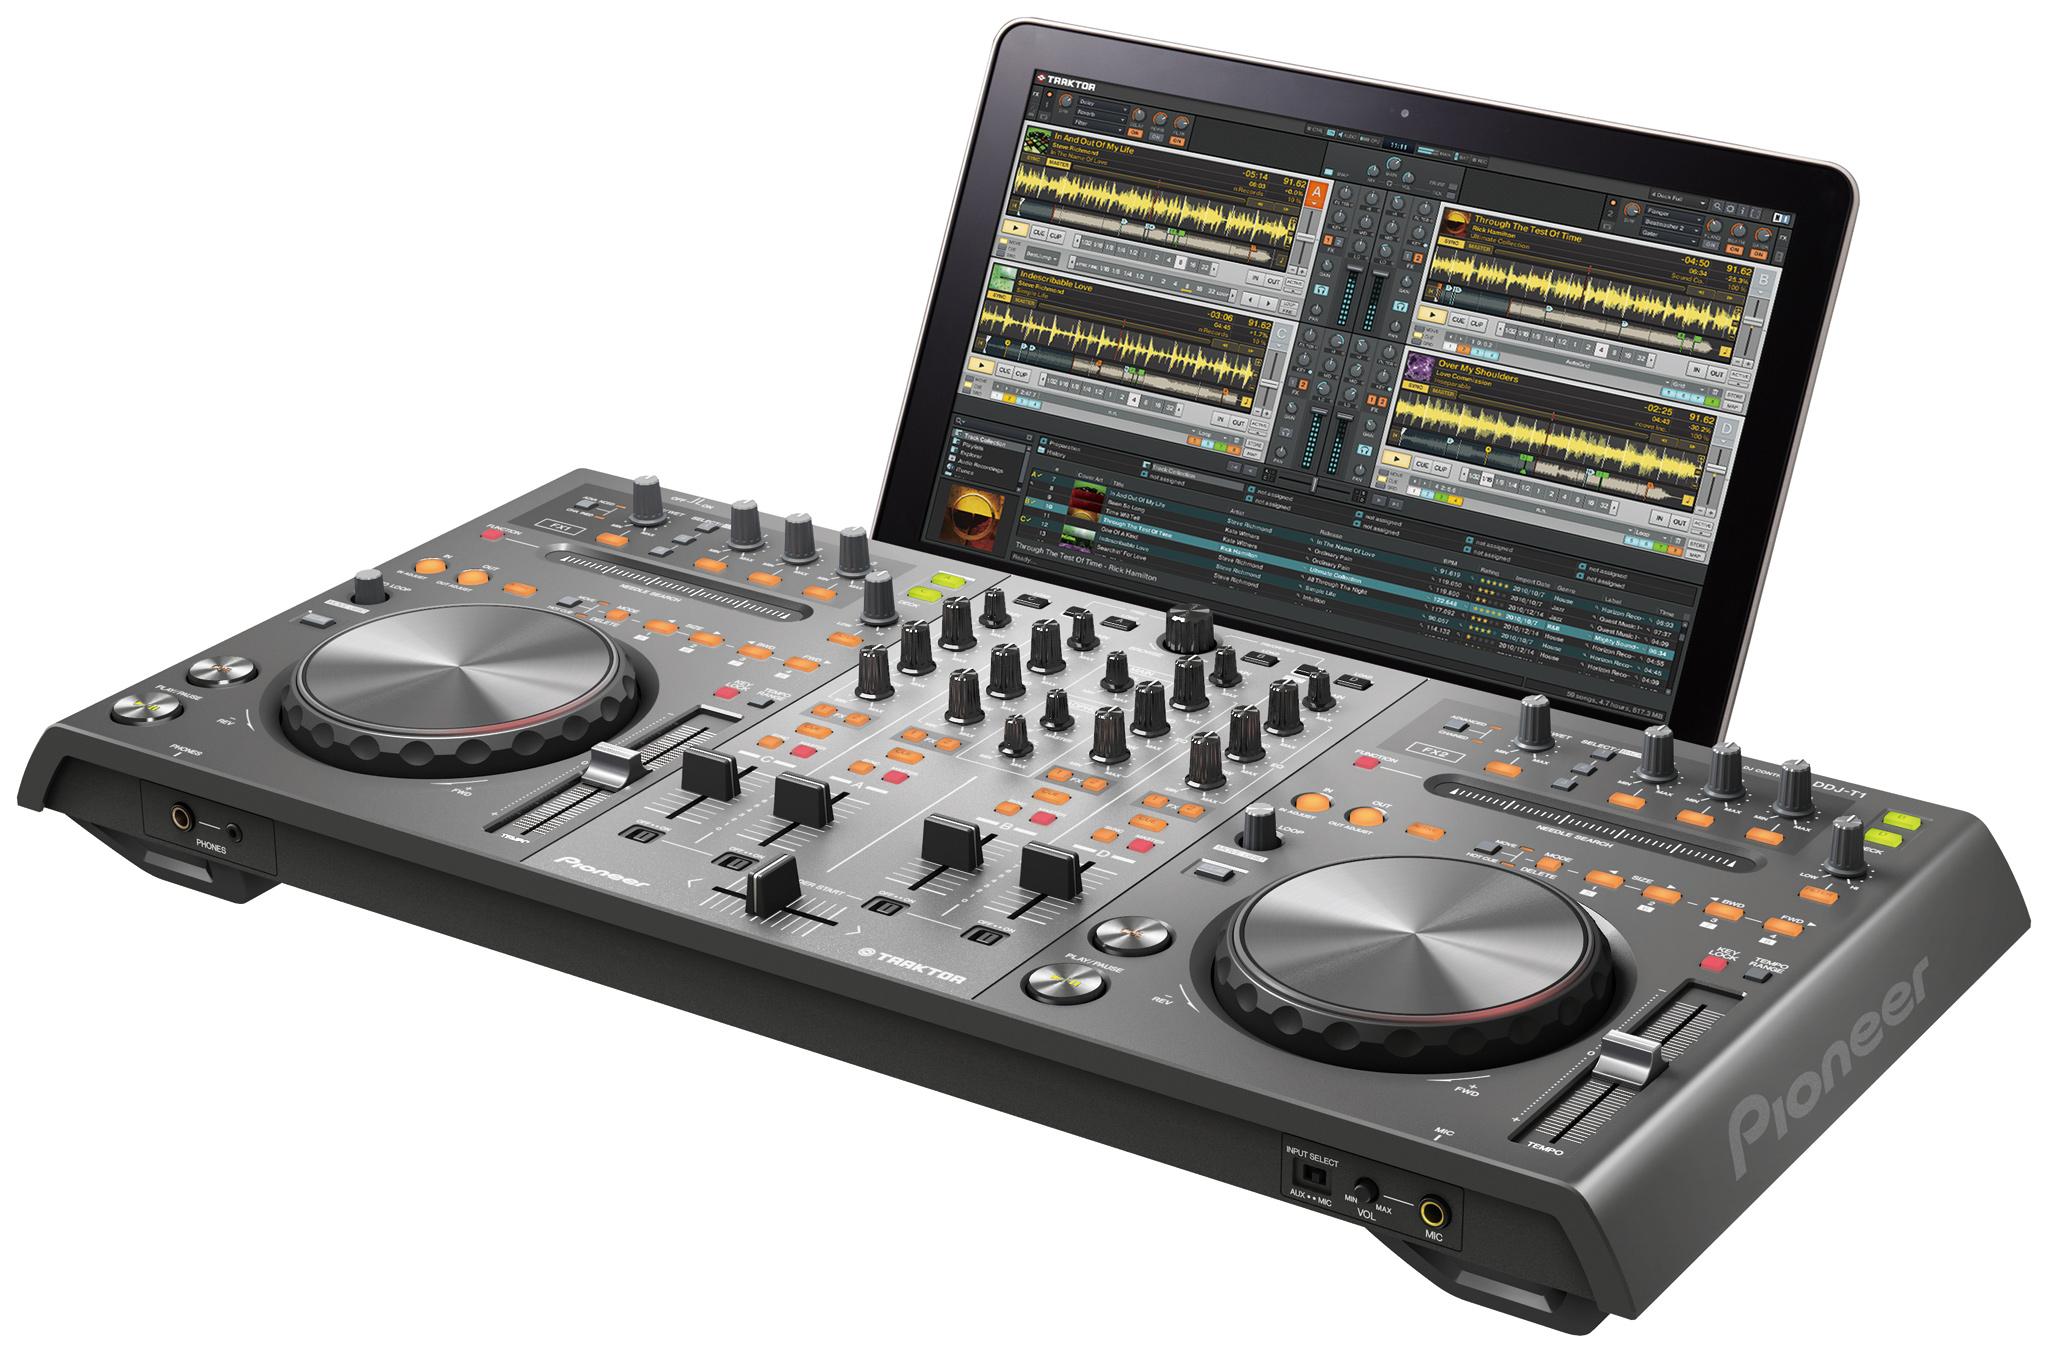 Digital dj decks